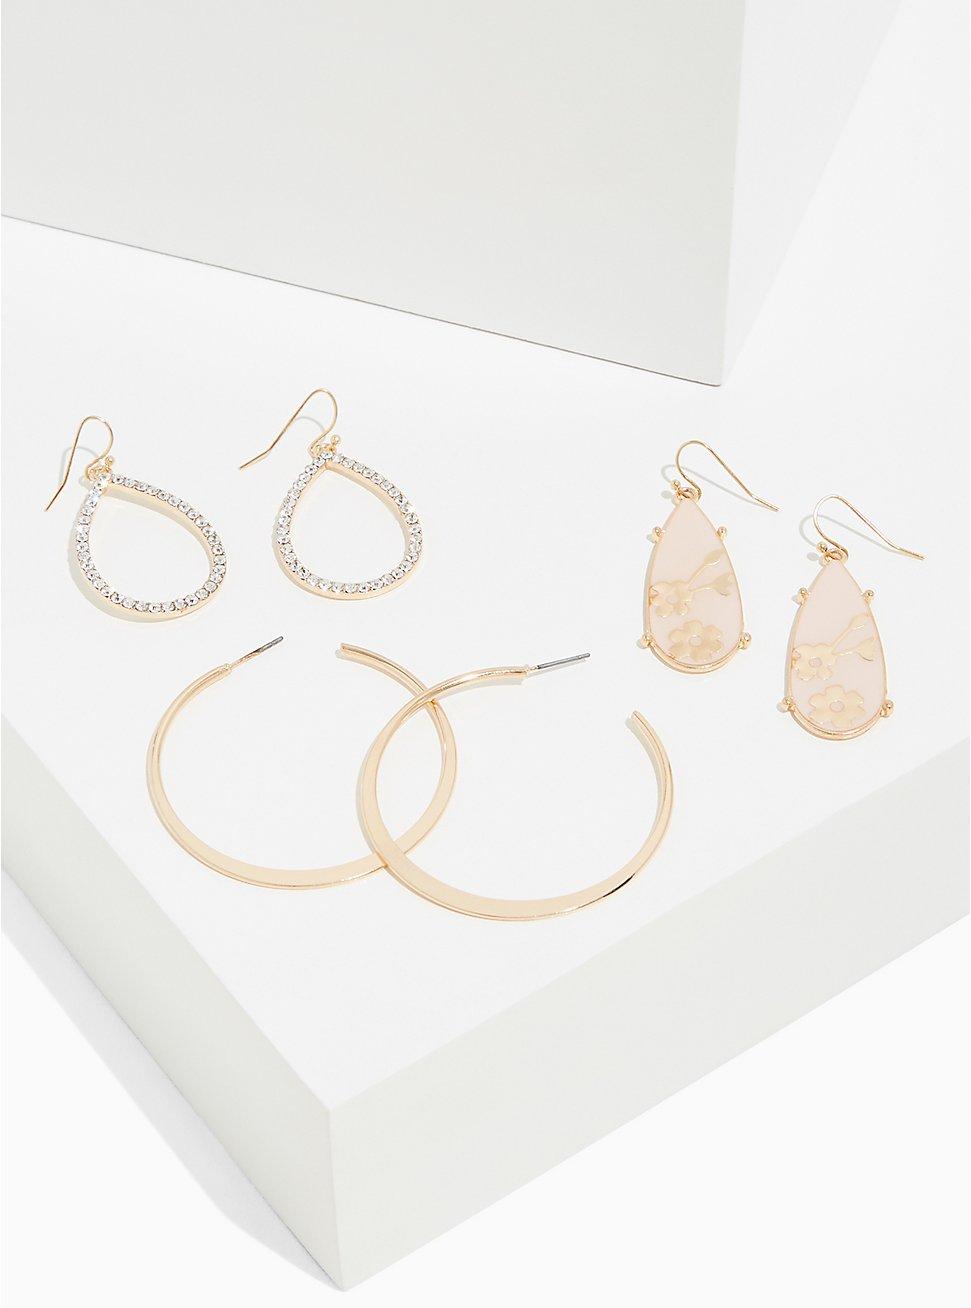 Light Pink Floral Drop Earrings Set - Set of 3, , hi-res